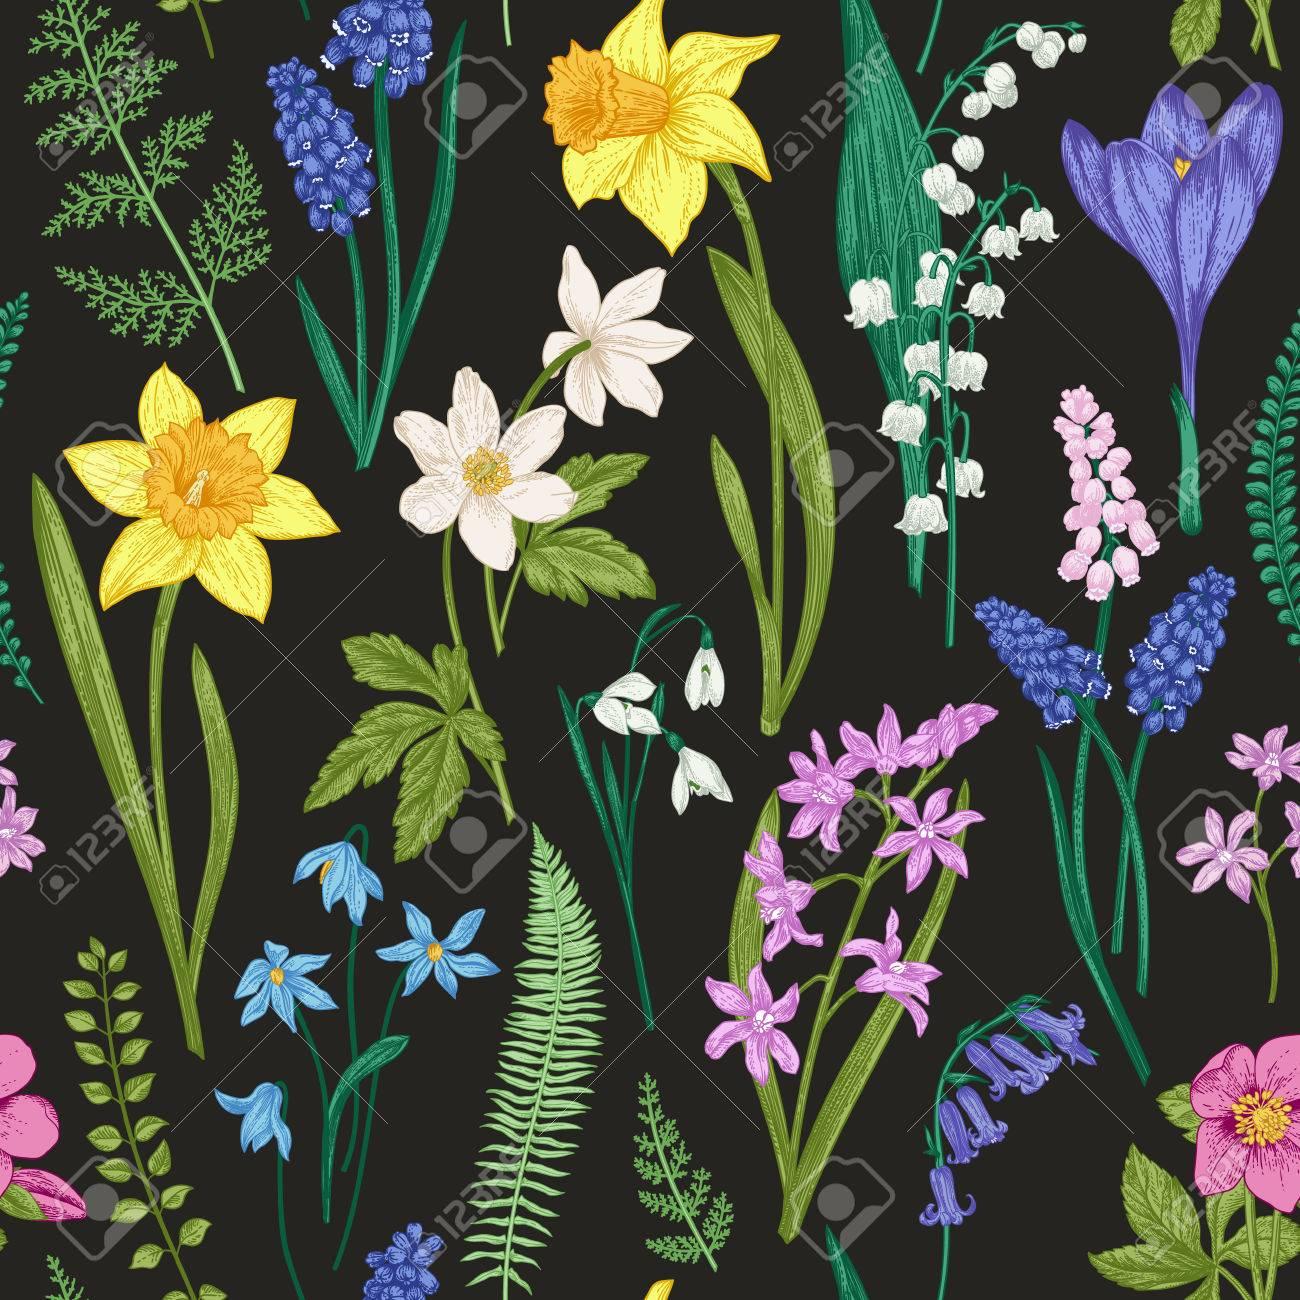 Vintage Patron Floral Transparente Sobre Un Fondo Negro Flores De